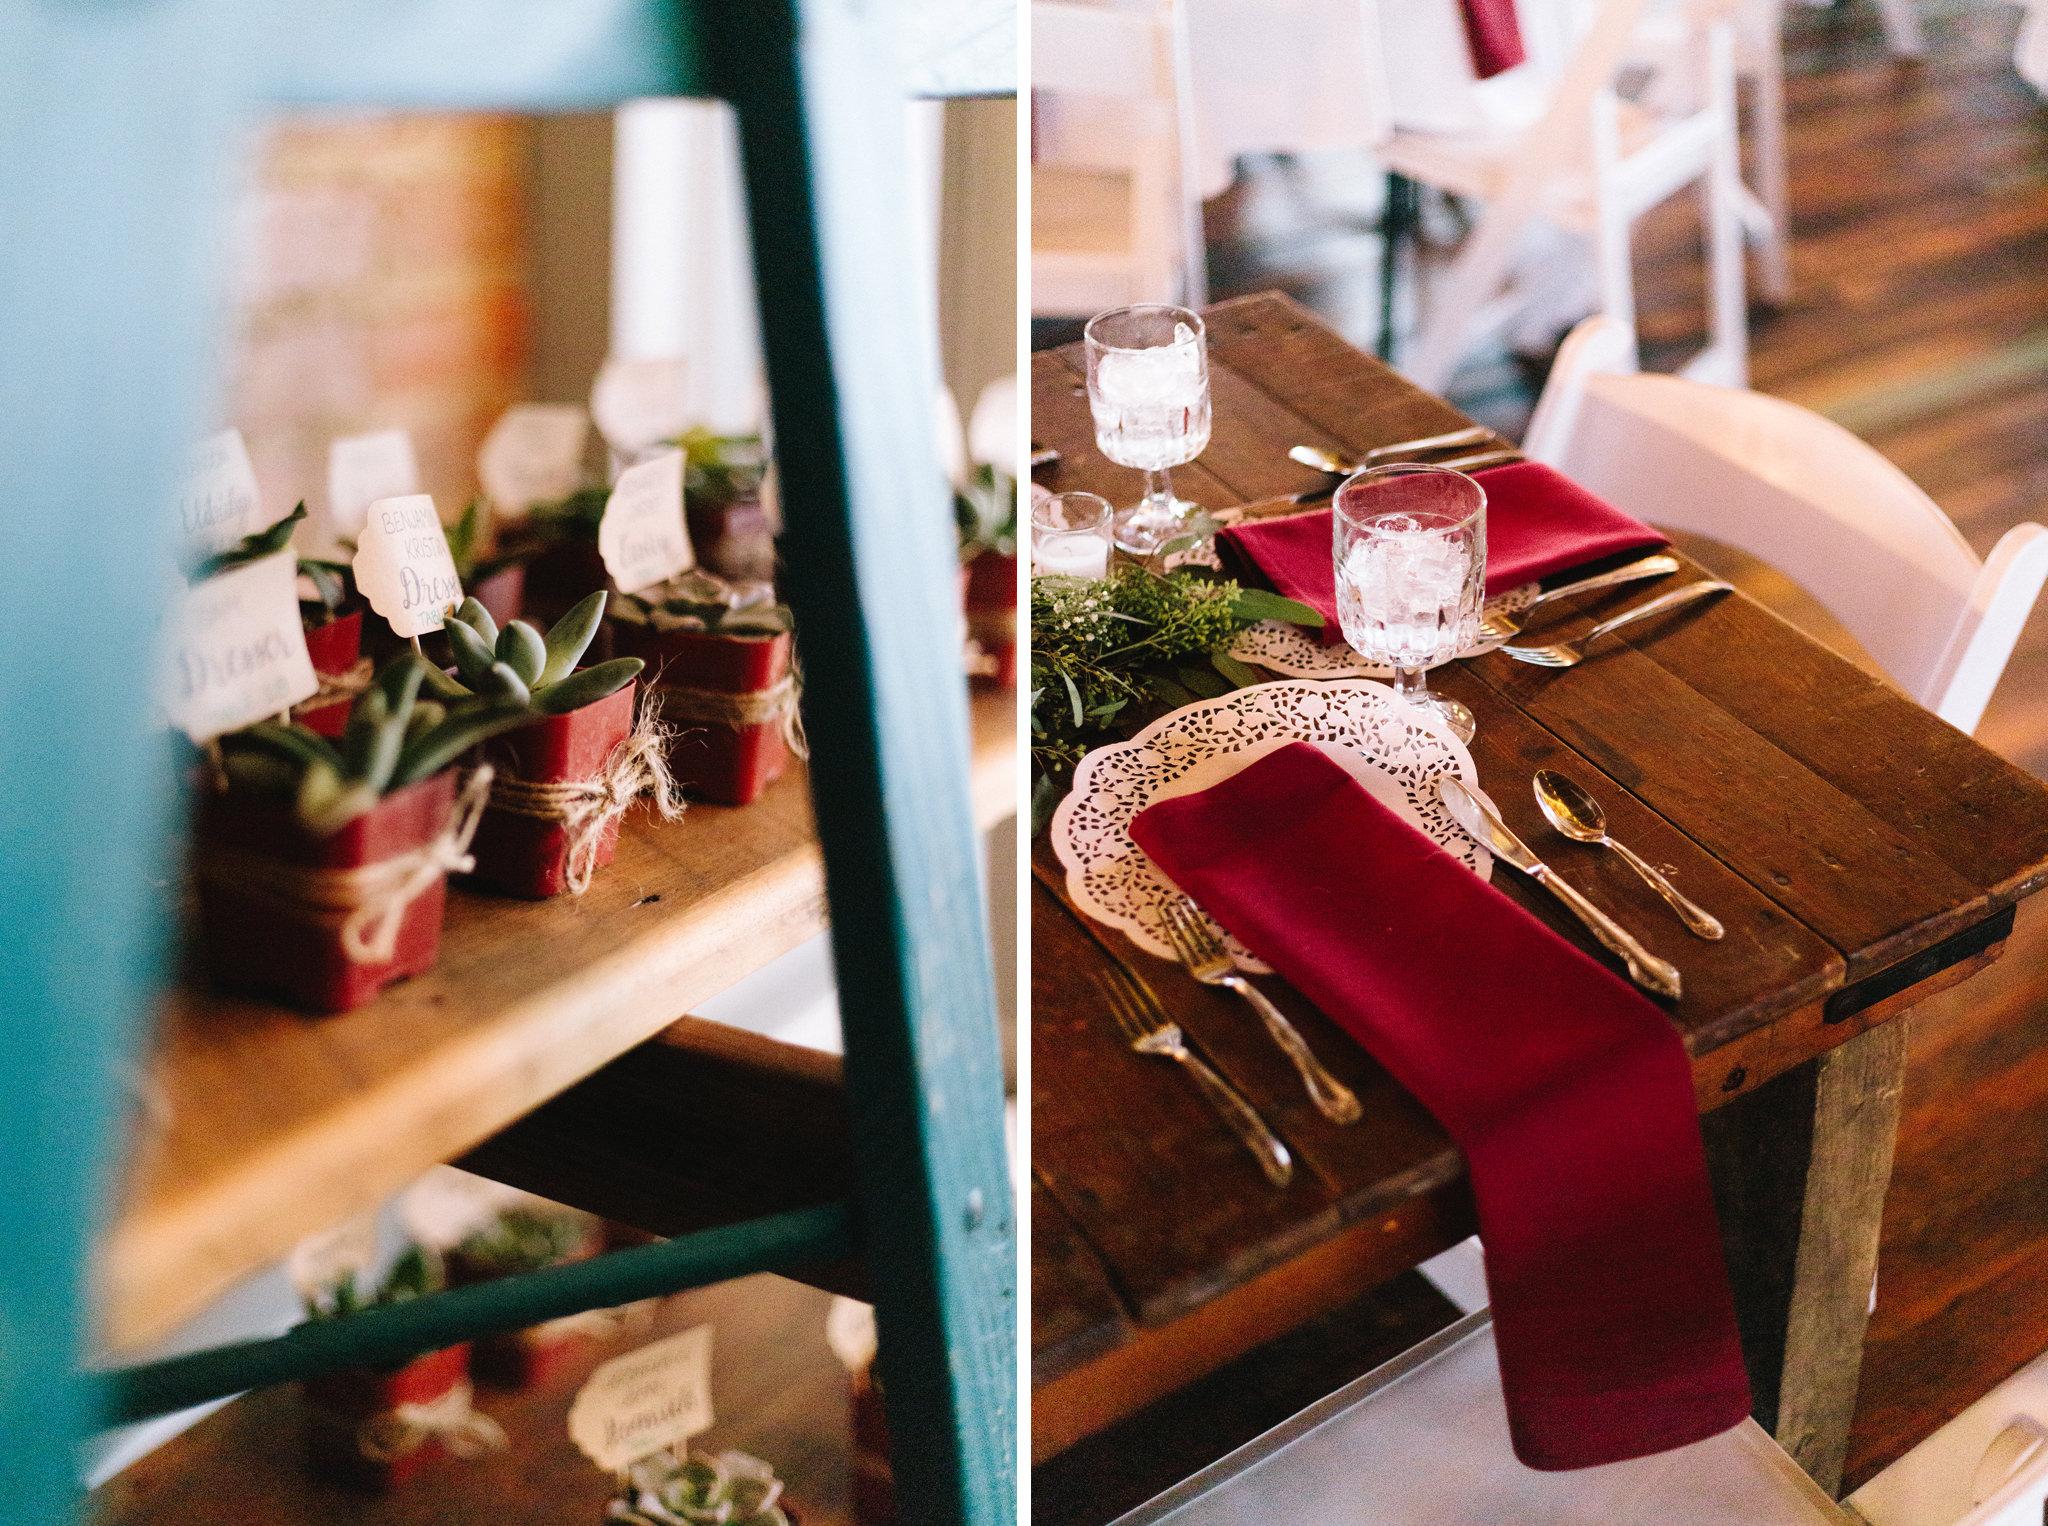 036-rempel-photography-chicago-wedding-inspiration-susan-daniel-michigan-metro-detroit-christian-church-holly-vault-cupcakes-and-kisses.jpg